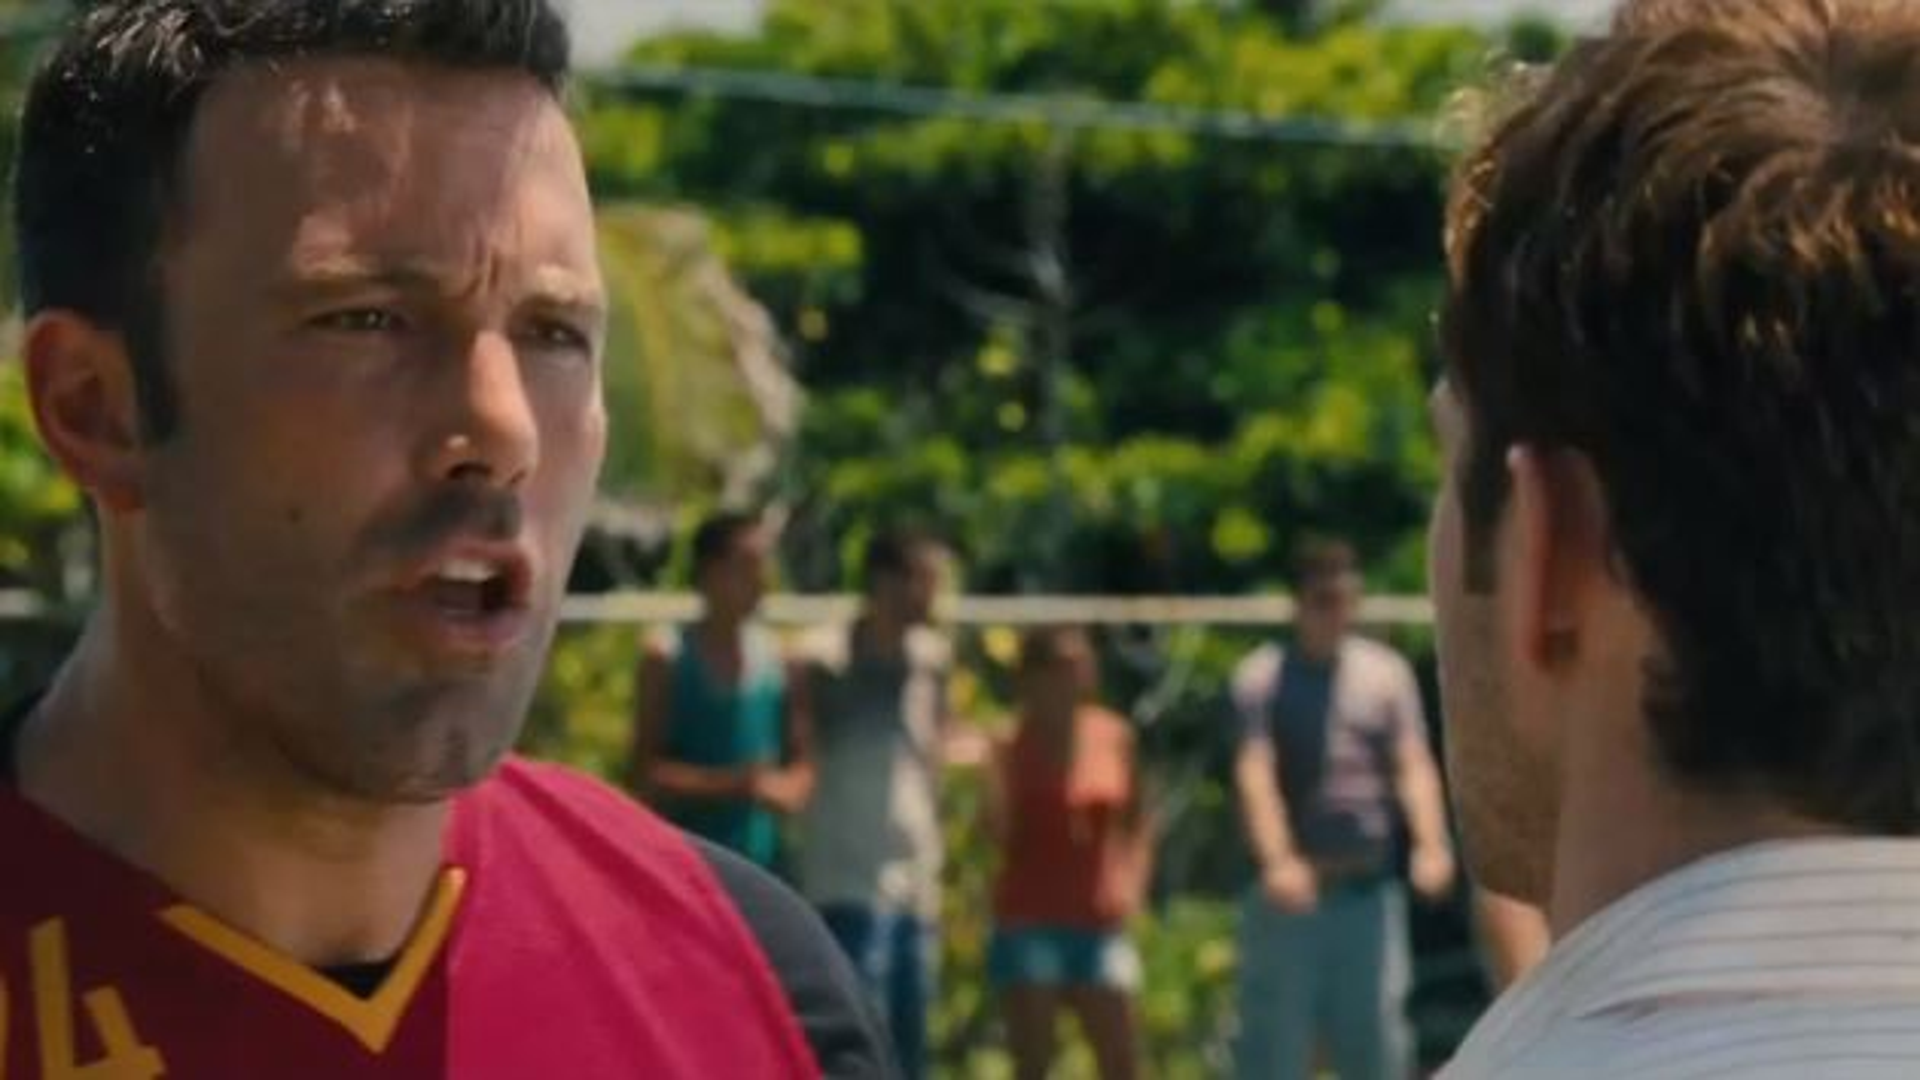 Ben-Affleck-Justin-Timberlake-Runner-Runner-Trailer